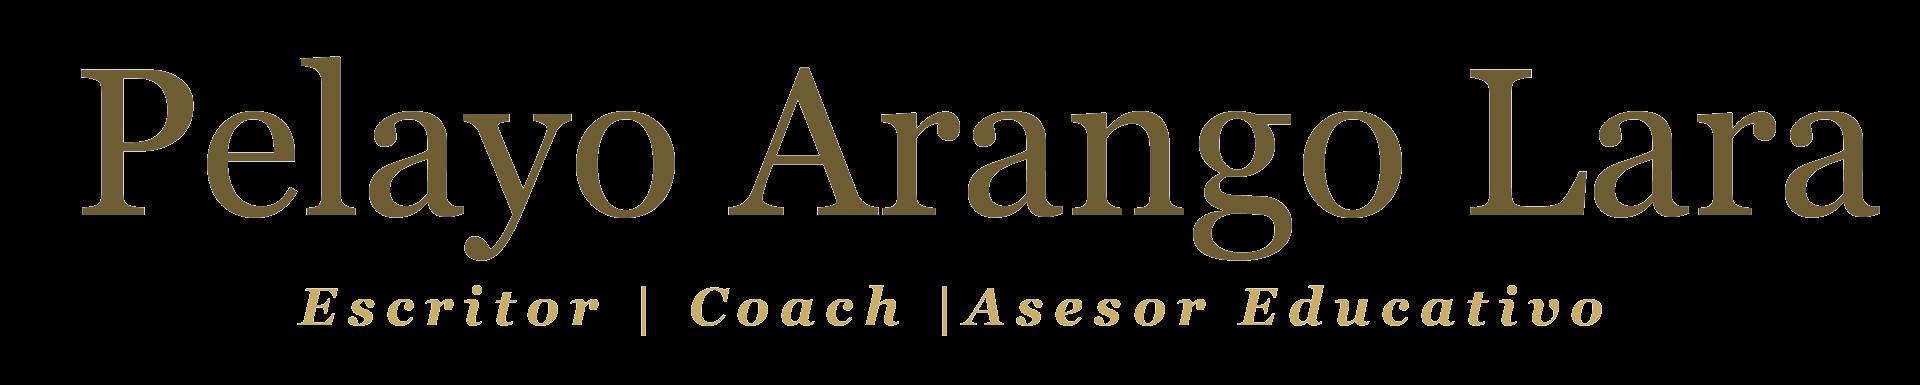 Blog Pelayo Arango